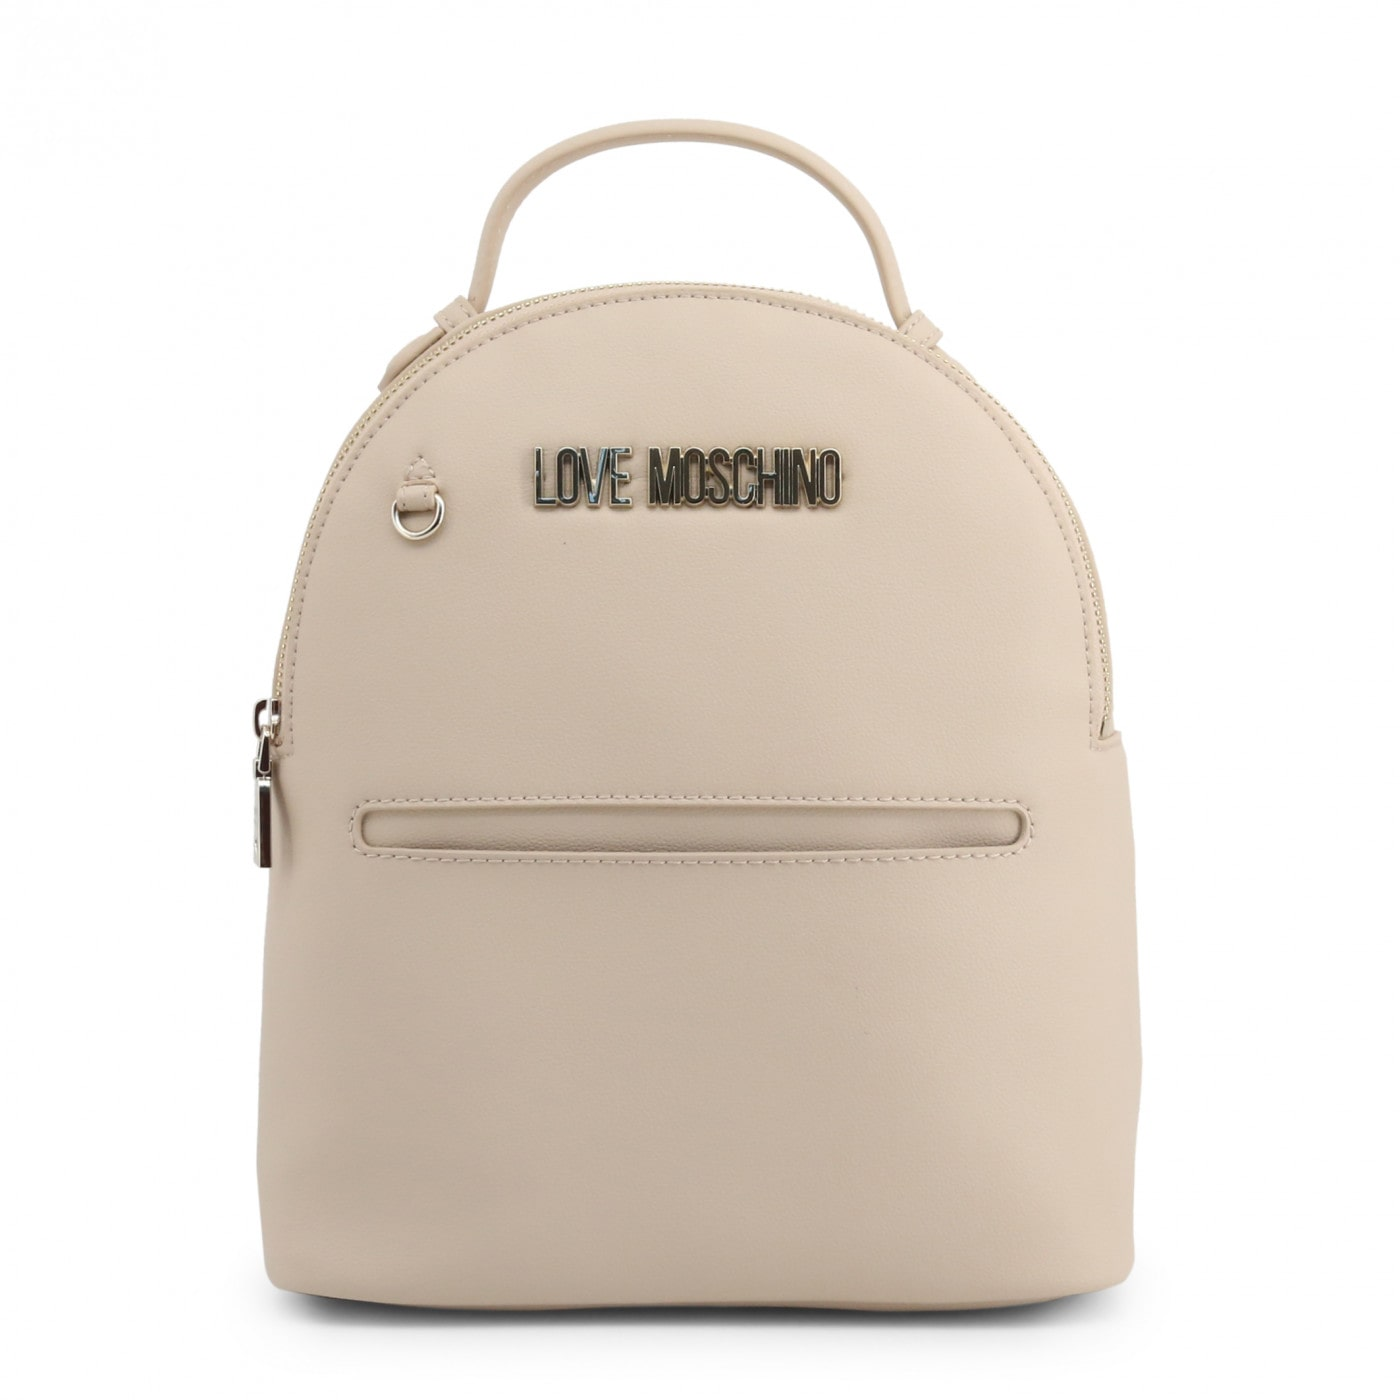 Backpack Love Moschino Fashion